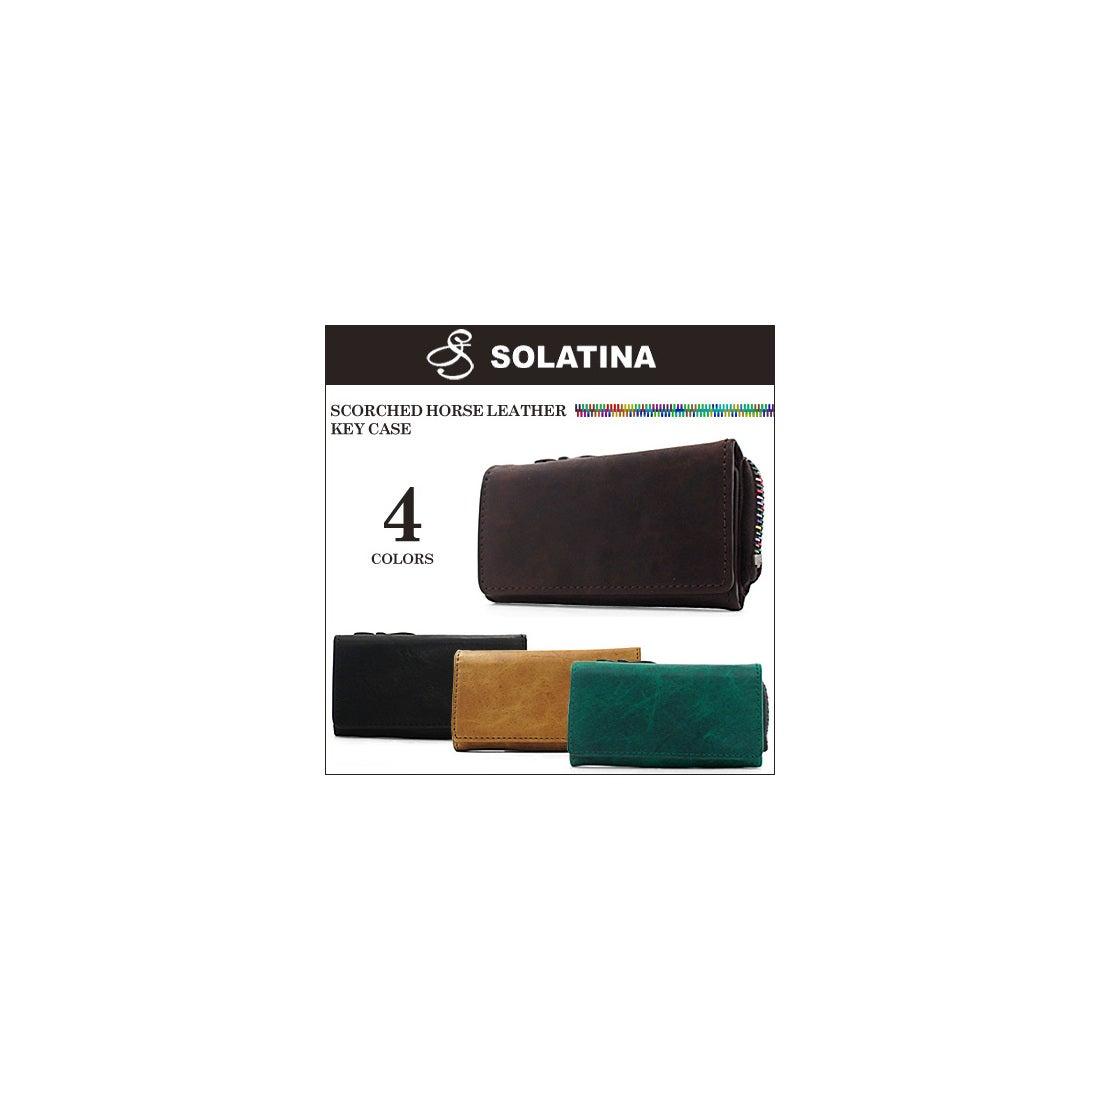 【SAC'S BAR】SOLATINA ソラチナ キーケース 38154 焦げ加工ホースレザー キーケース 全4色 BROWN メンズ